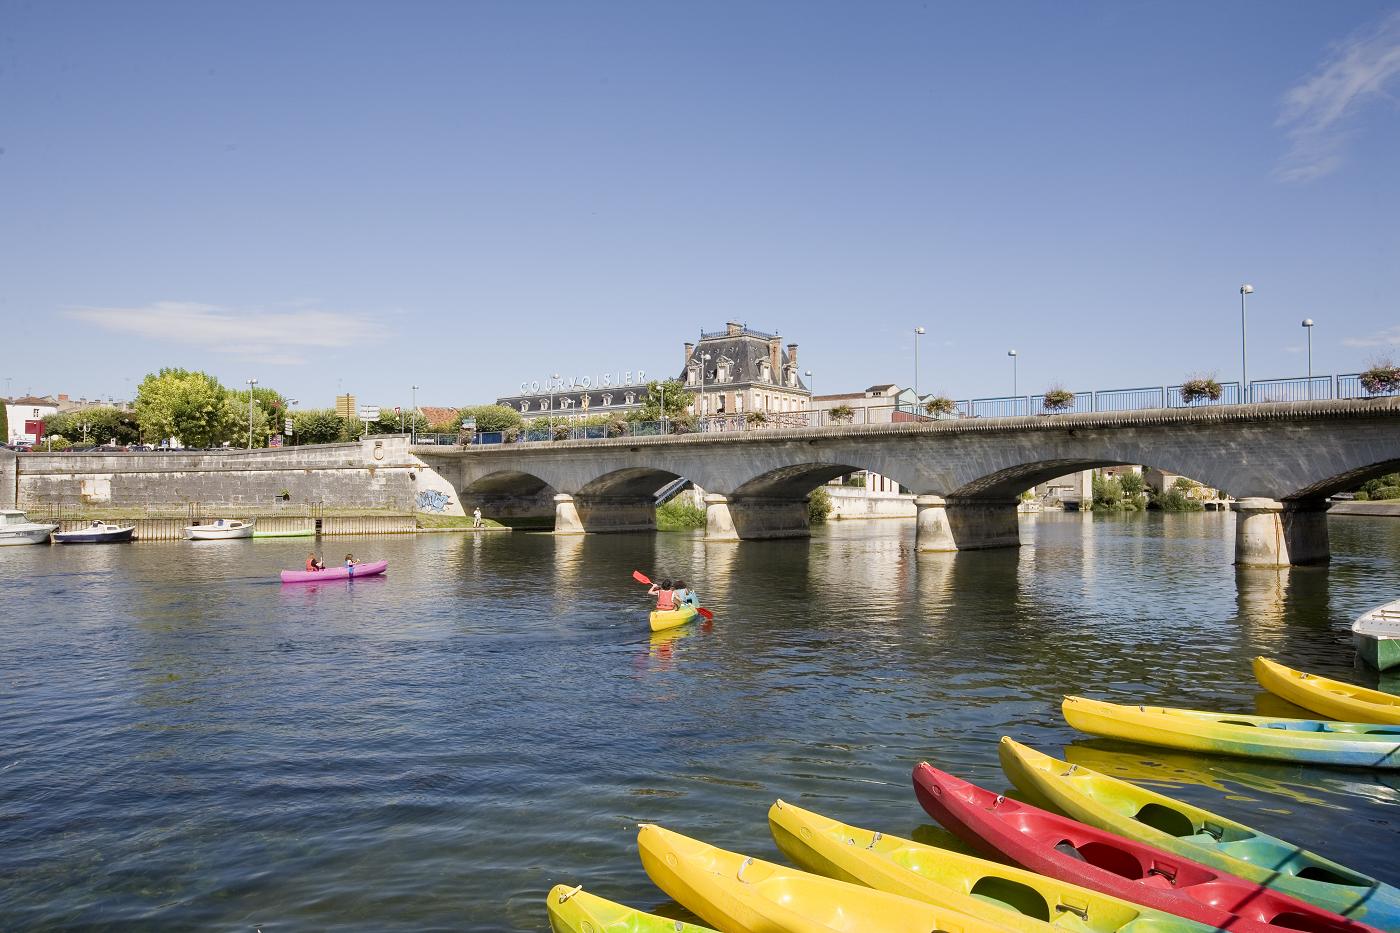 La charente le fleuve charente d 39 angoul me rochefort for Rochefort angouleme